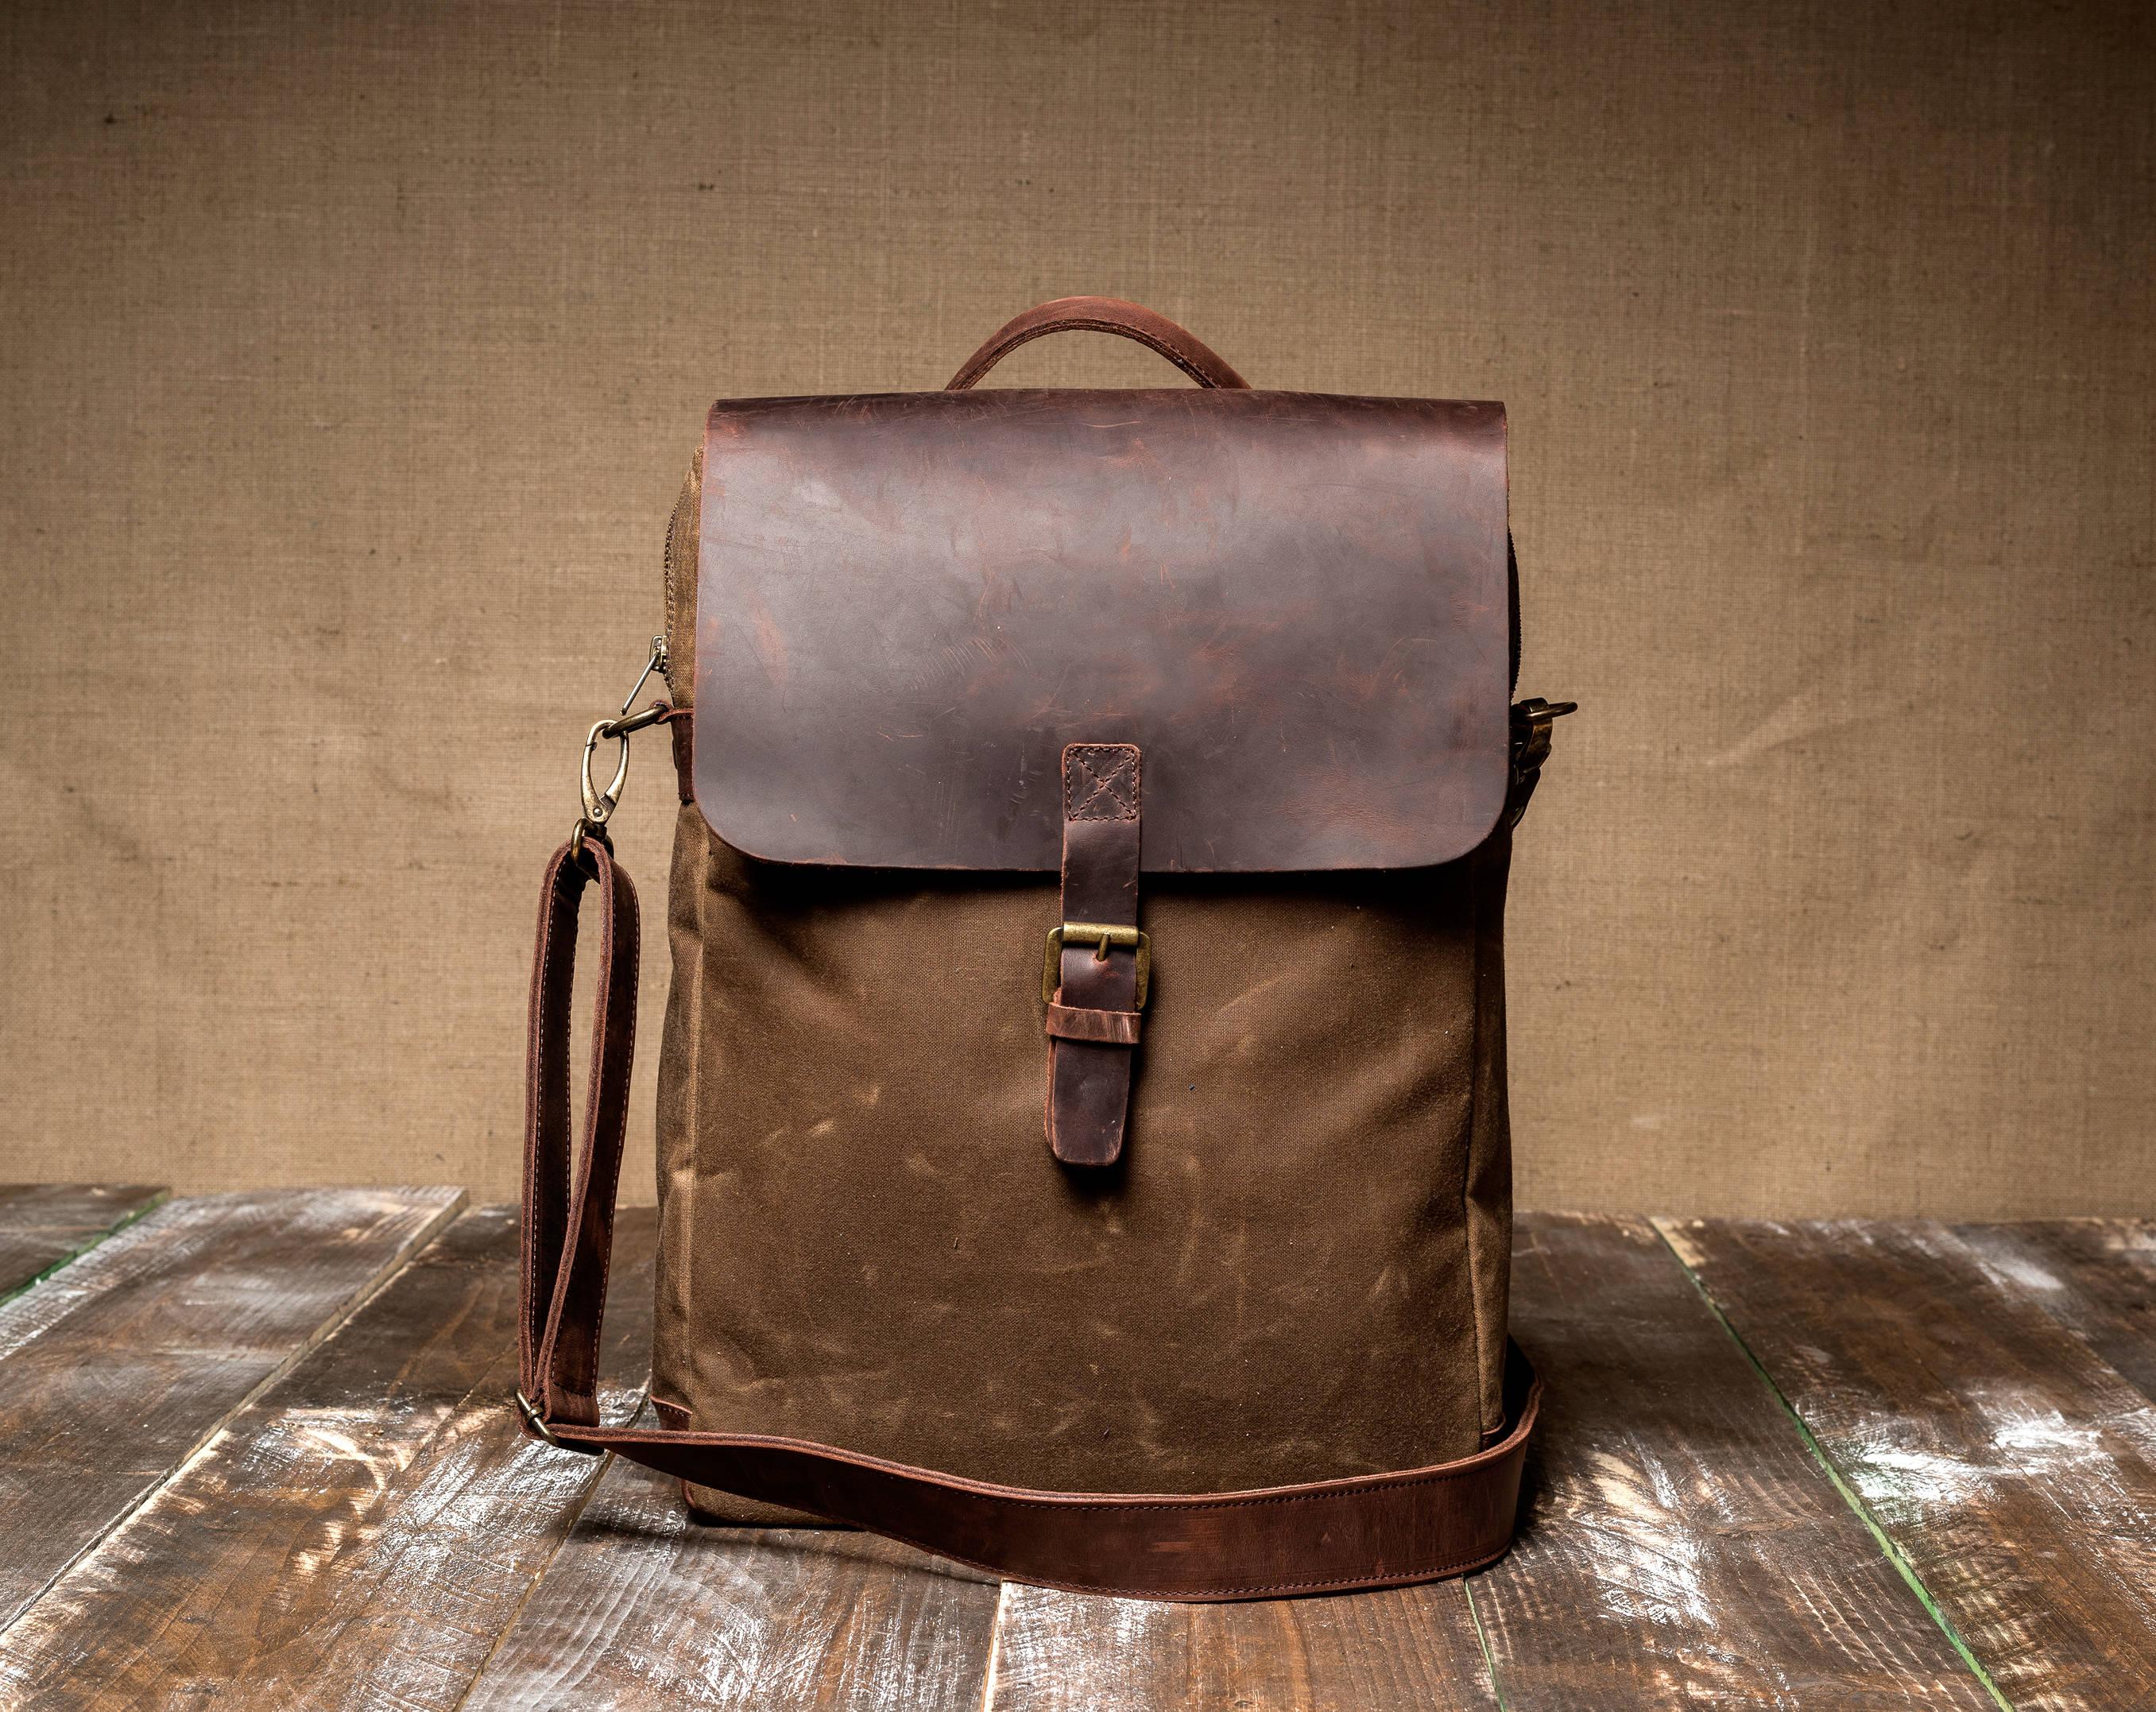 2175f3c61991 Man Bag made of Waxed Canvas Crossbody Bag for Man Canvas